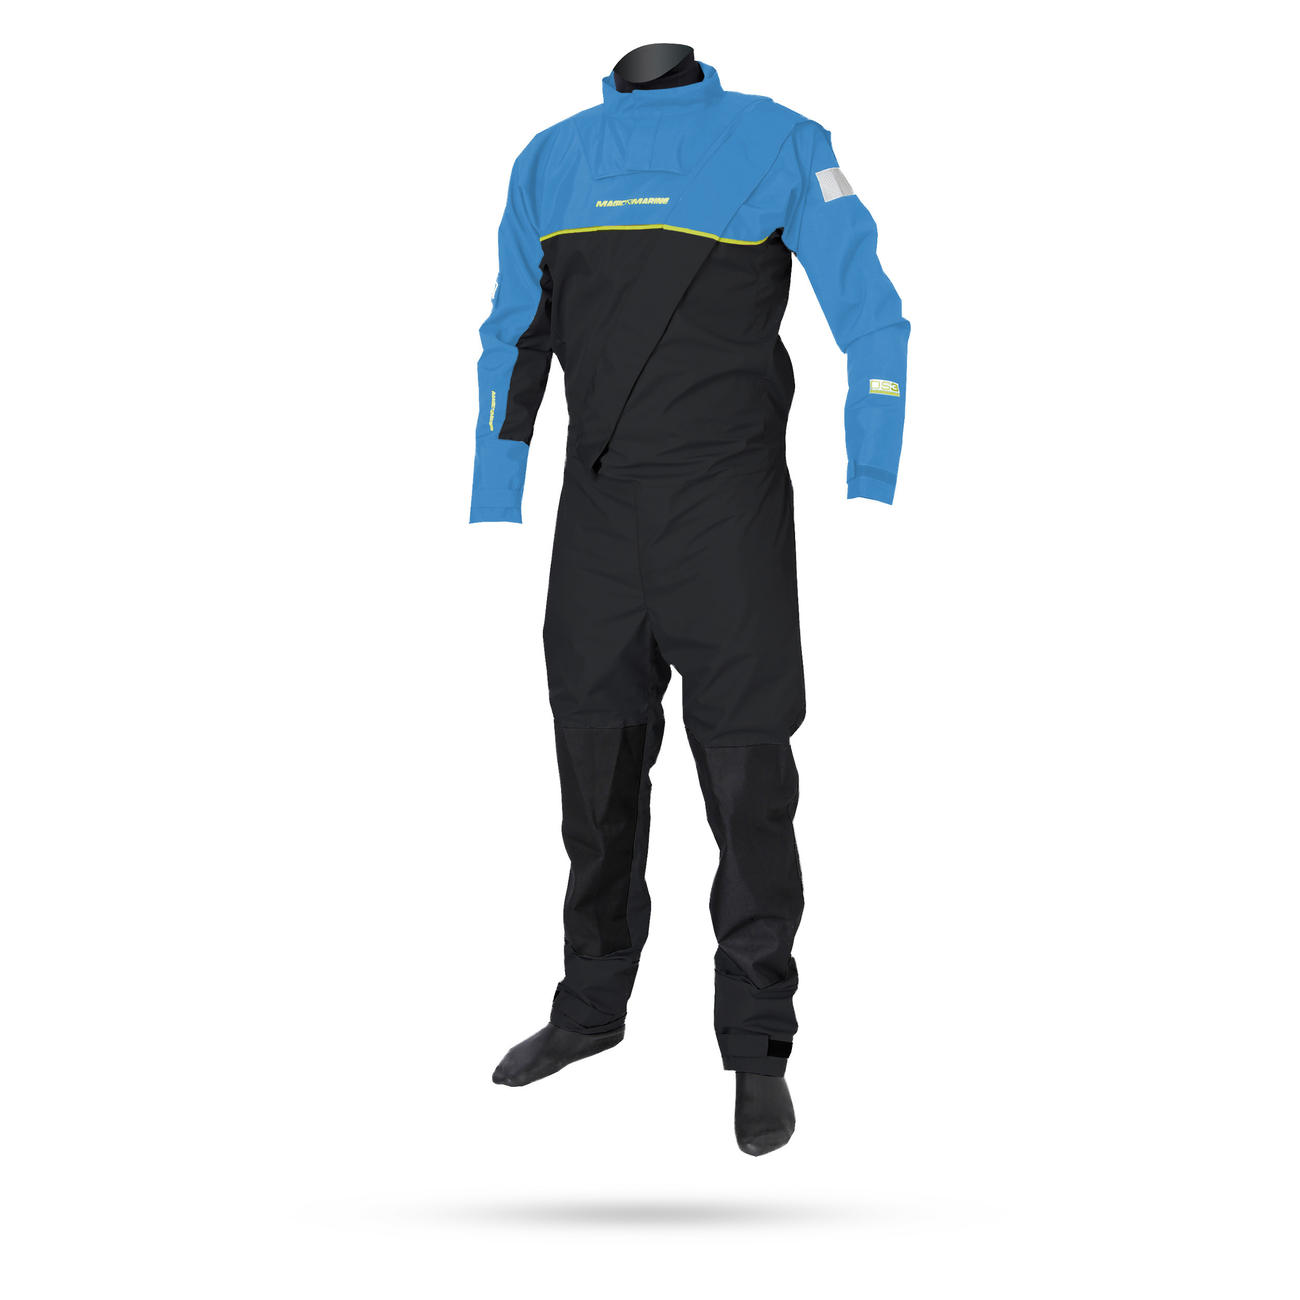 Regatta Breathable Drysuit with Socks (frontzip) シェルドライスーツ